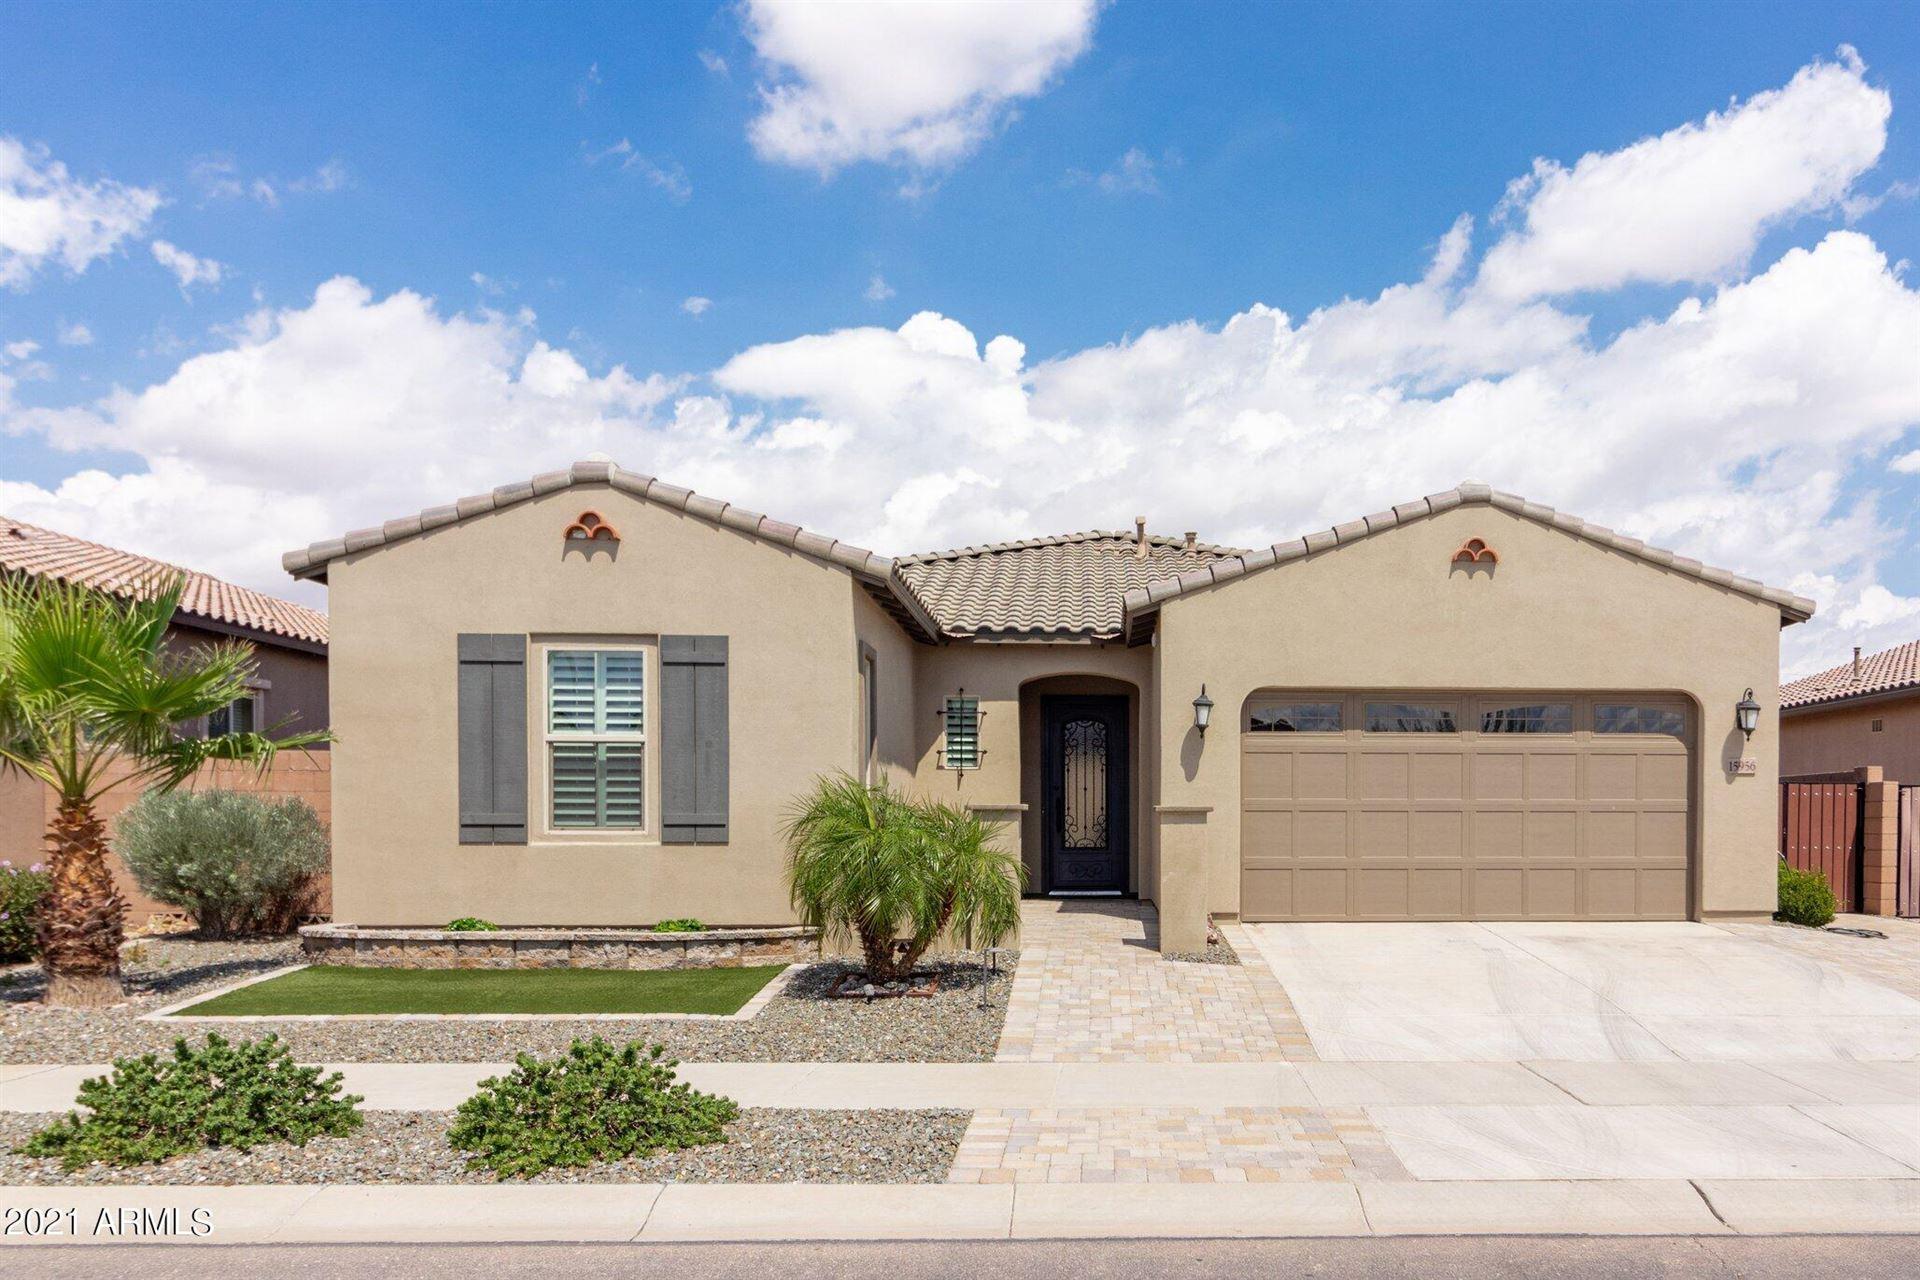 15956 W DESERT HILLS Drive, Surprise, AZ 85379 - MLS#: 6288319